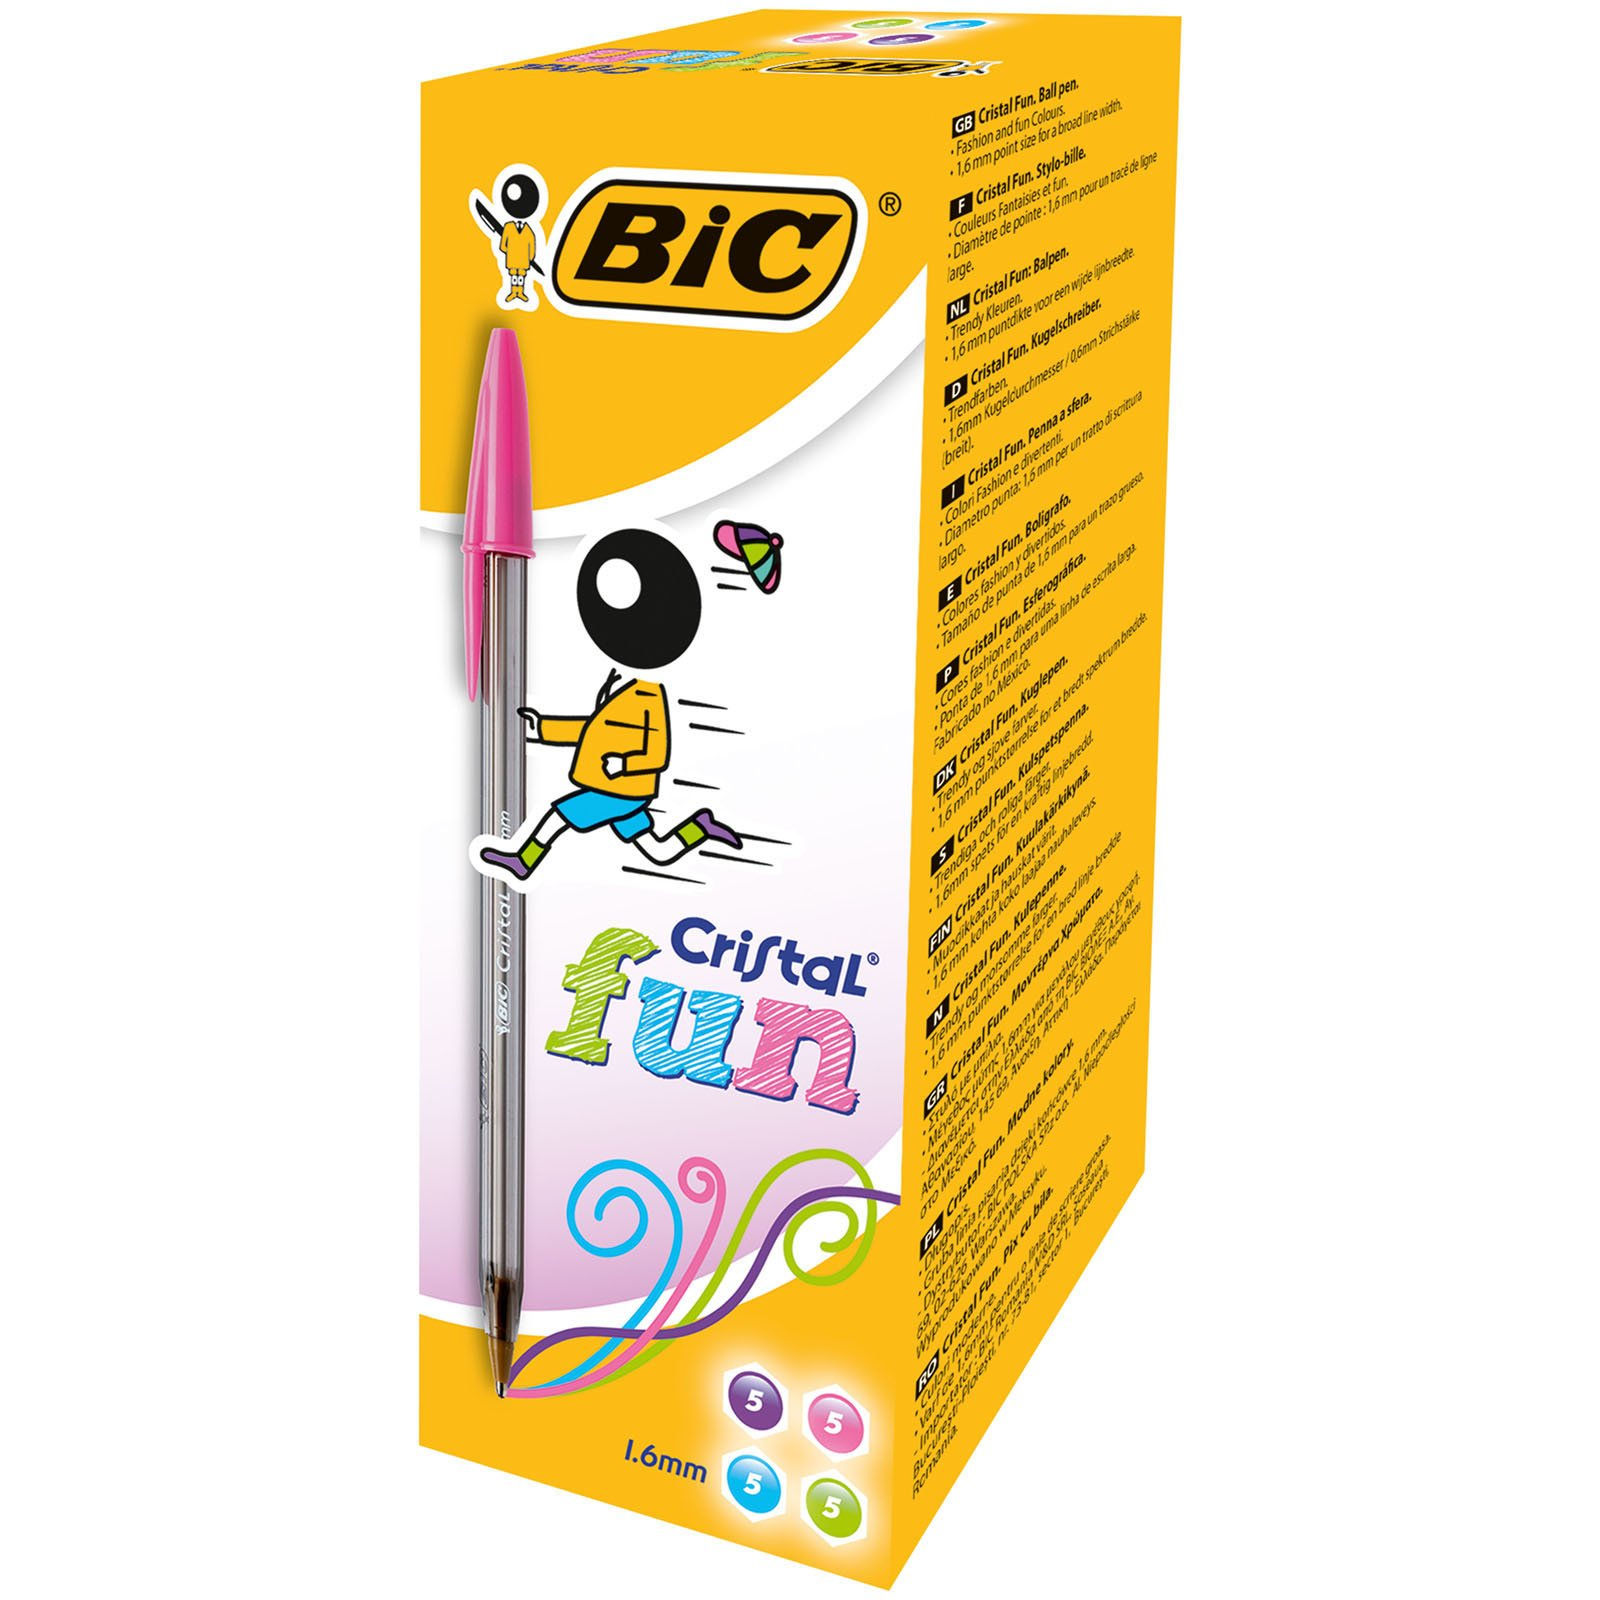 BIC Cristal Fun - Caja de 20 unidades, bolígrafos punta ancha (1,6 mm), colores surtidos product image